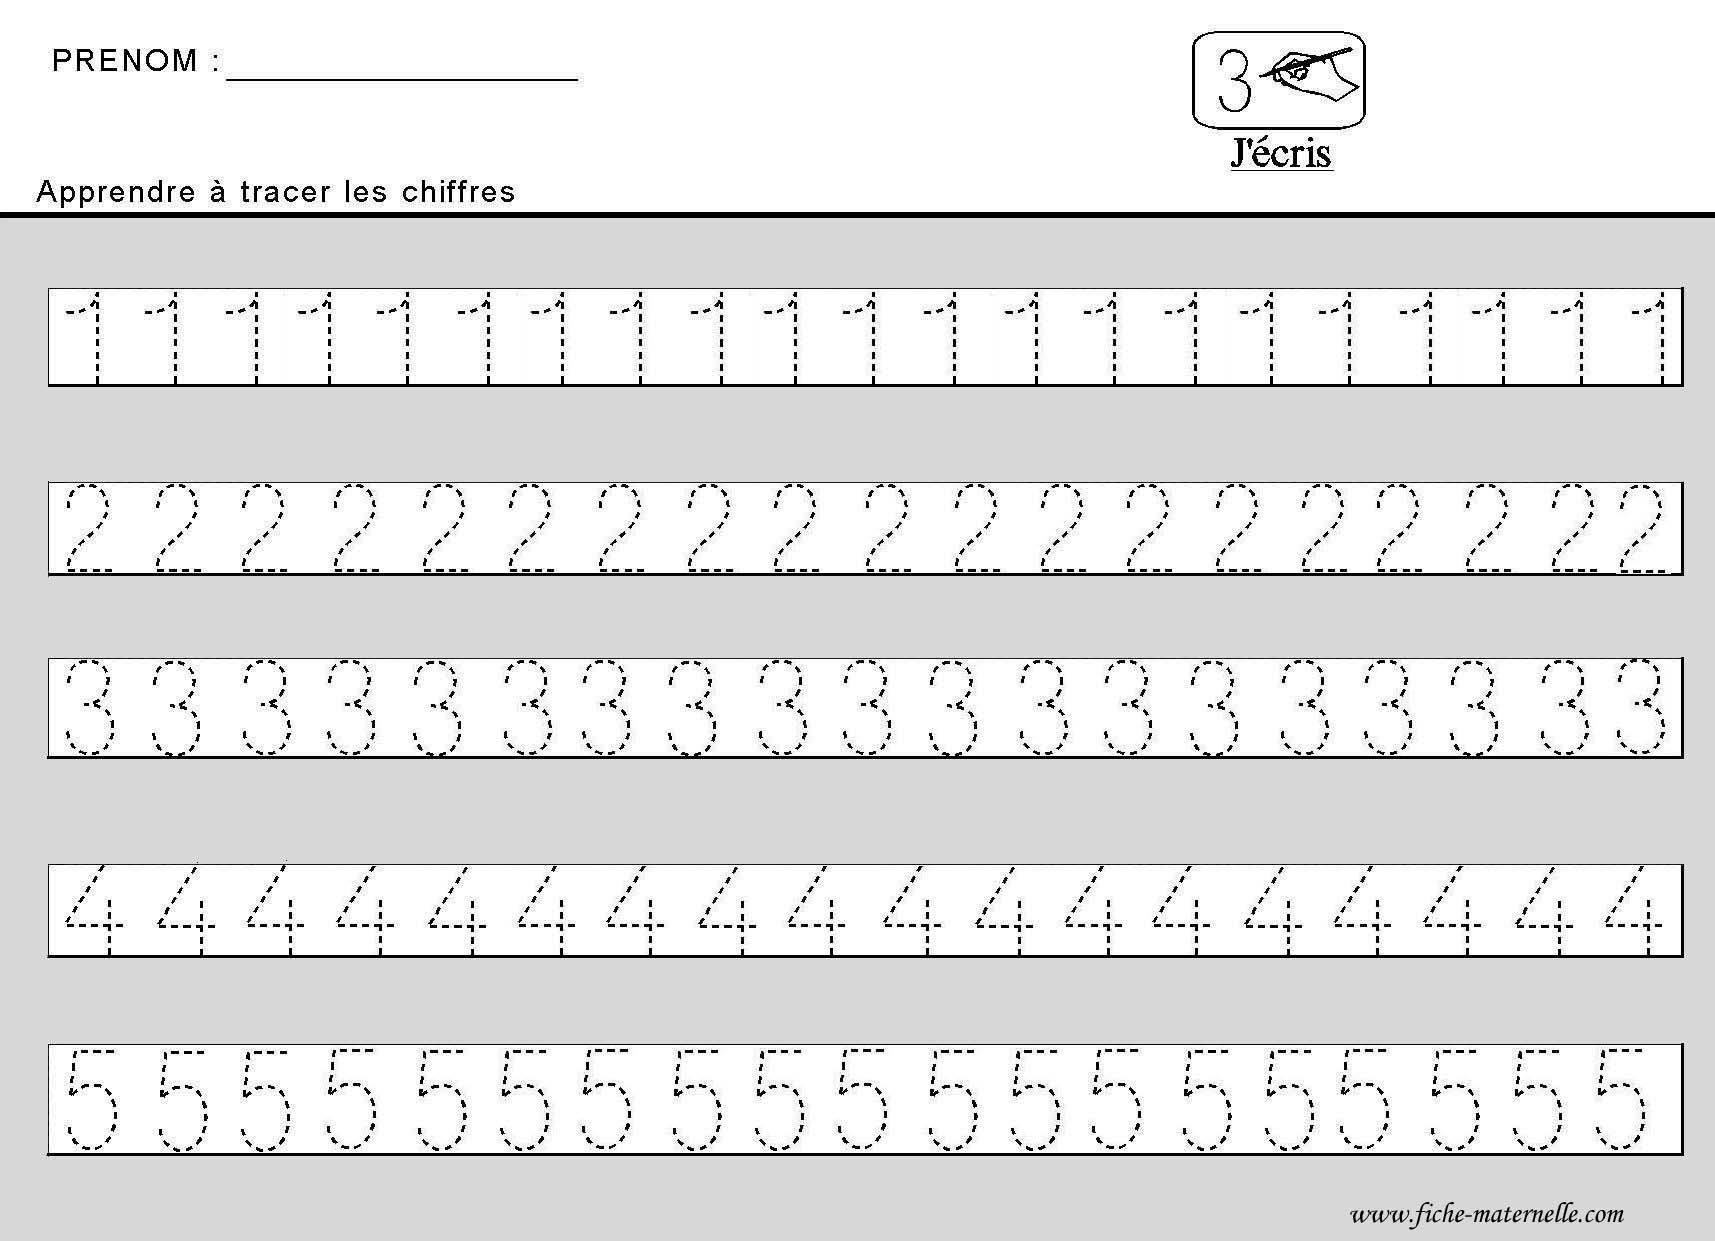 Beliebt Site maternelle : apprendre à tracer des chiffres en moyenne section GL28